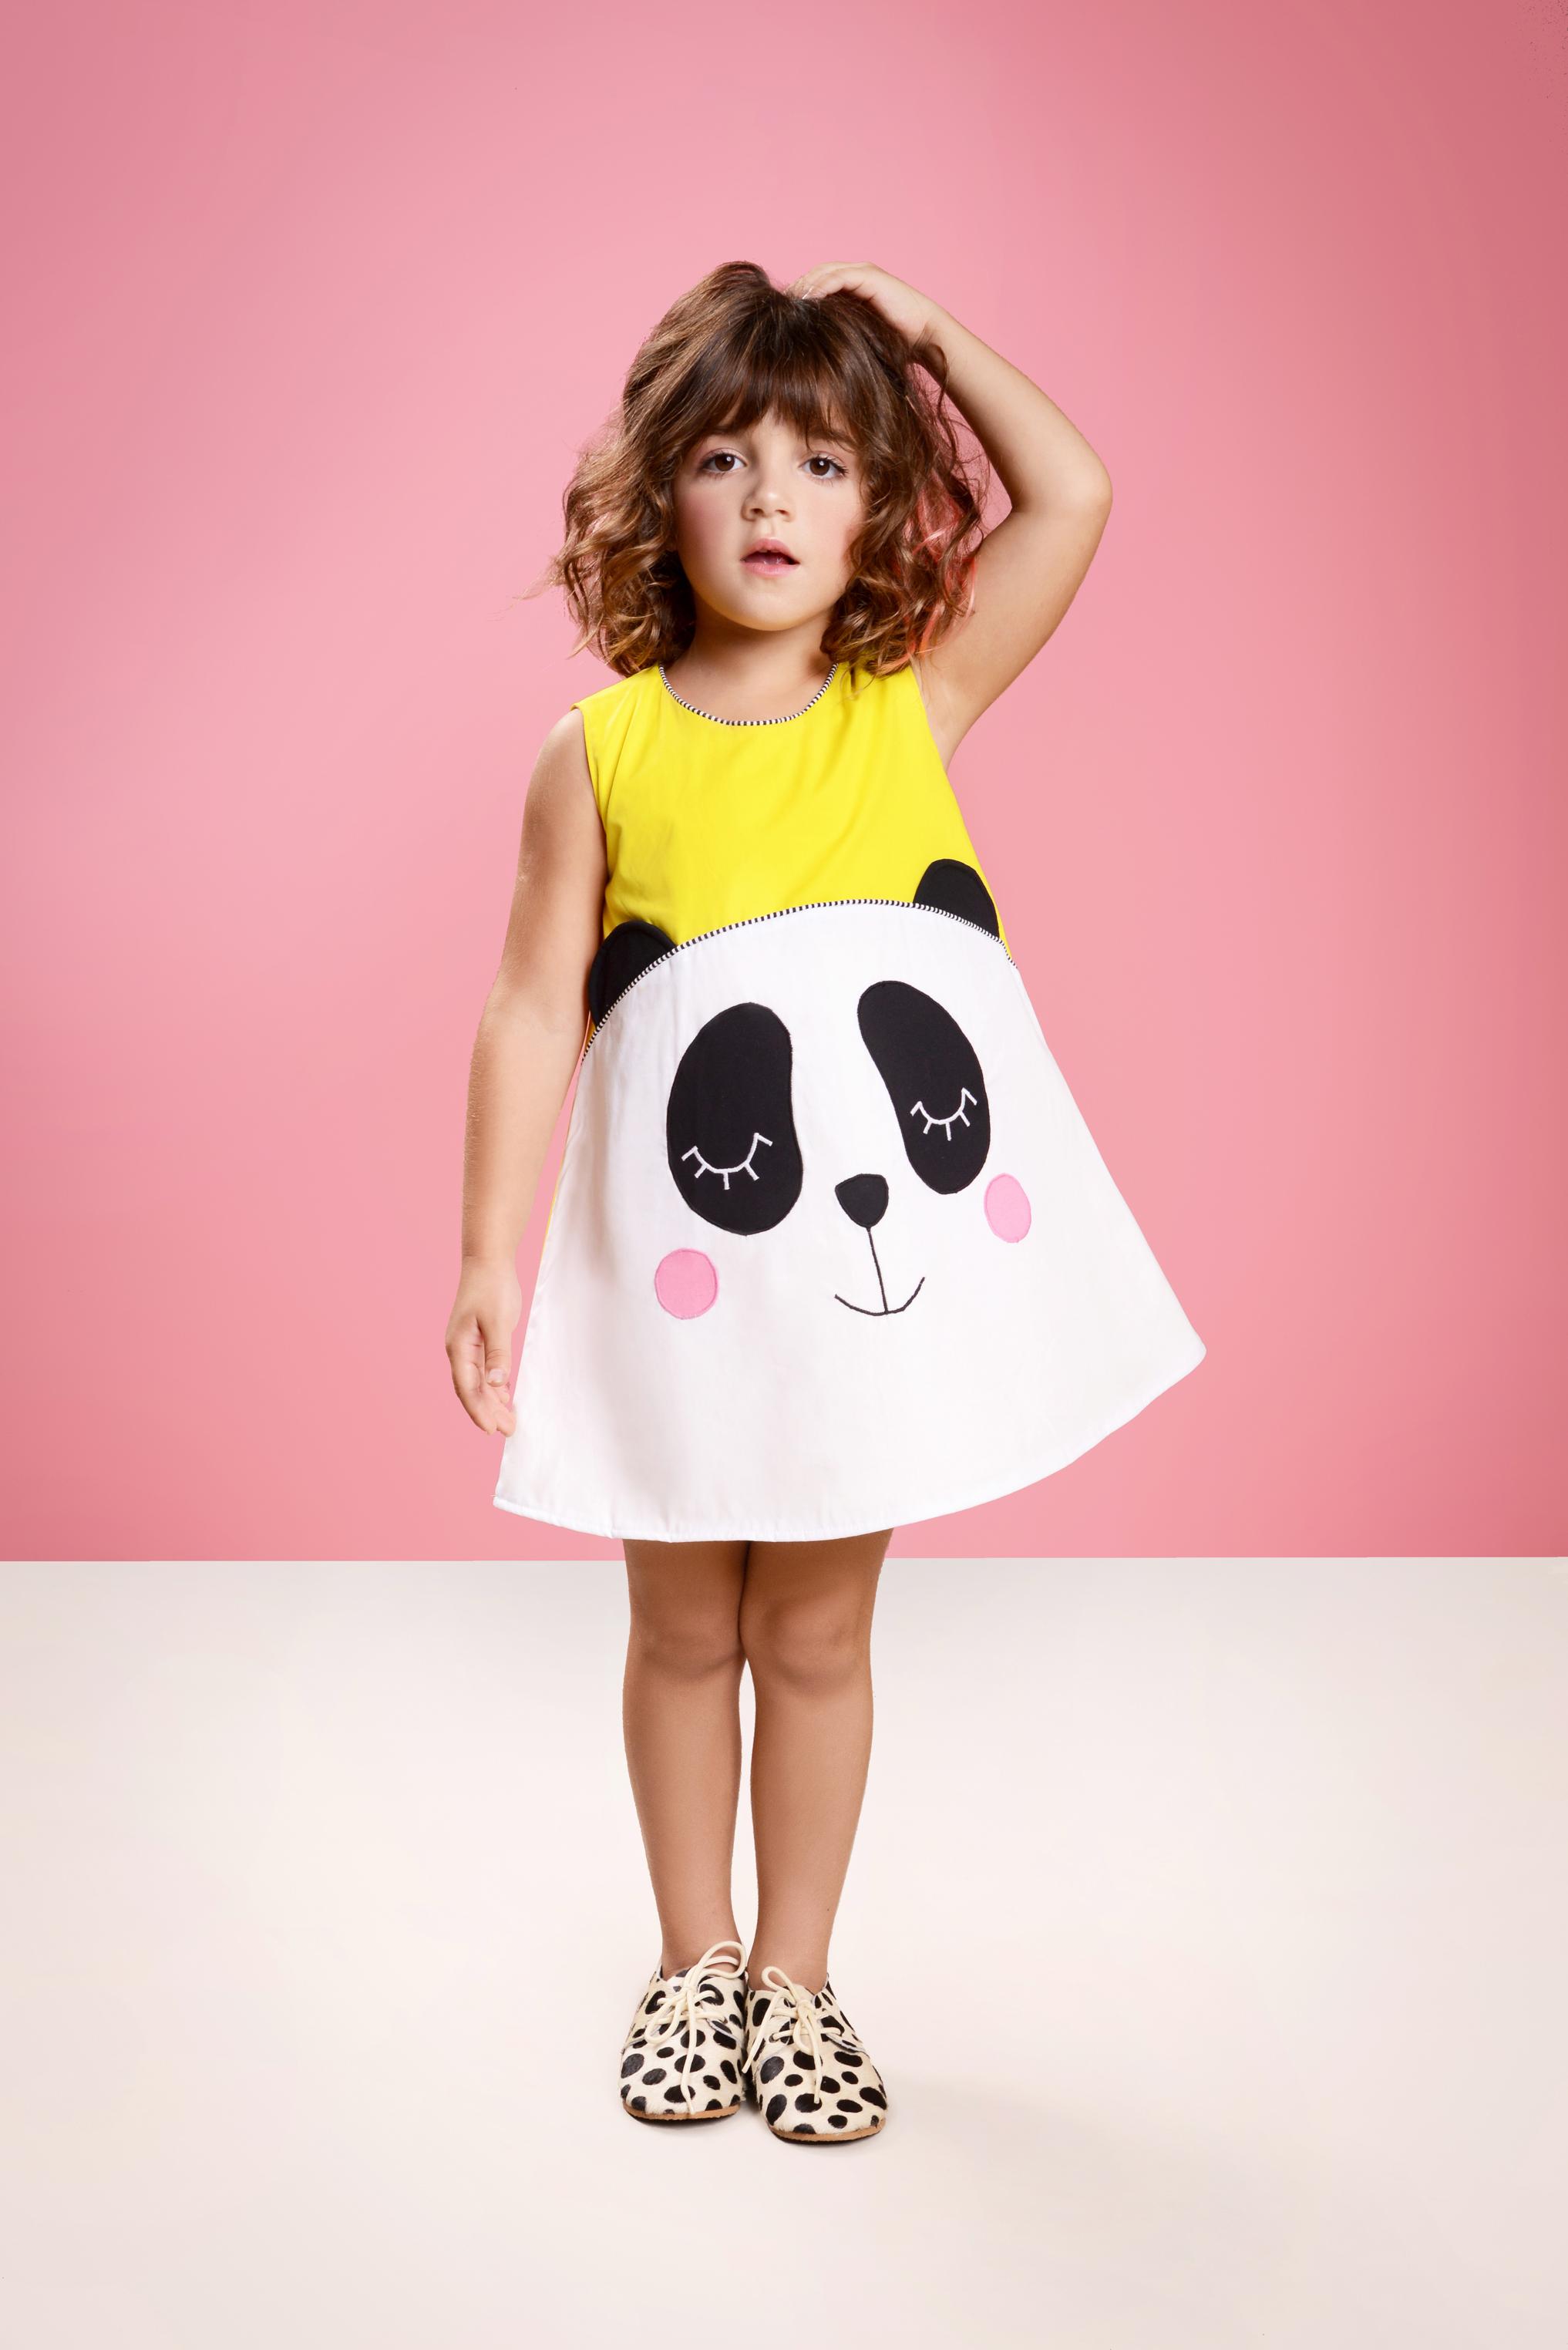 Panôli_Primavera/Verão_Vestido Panda